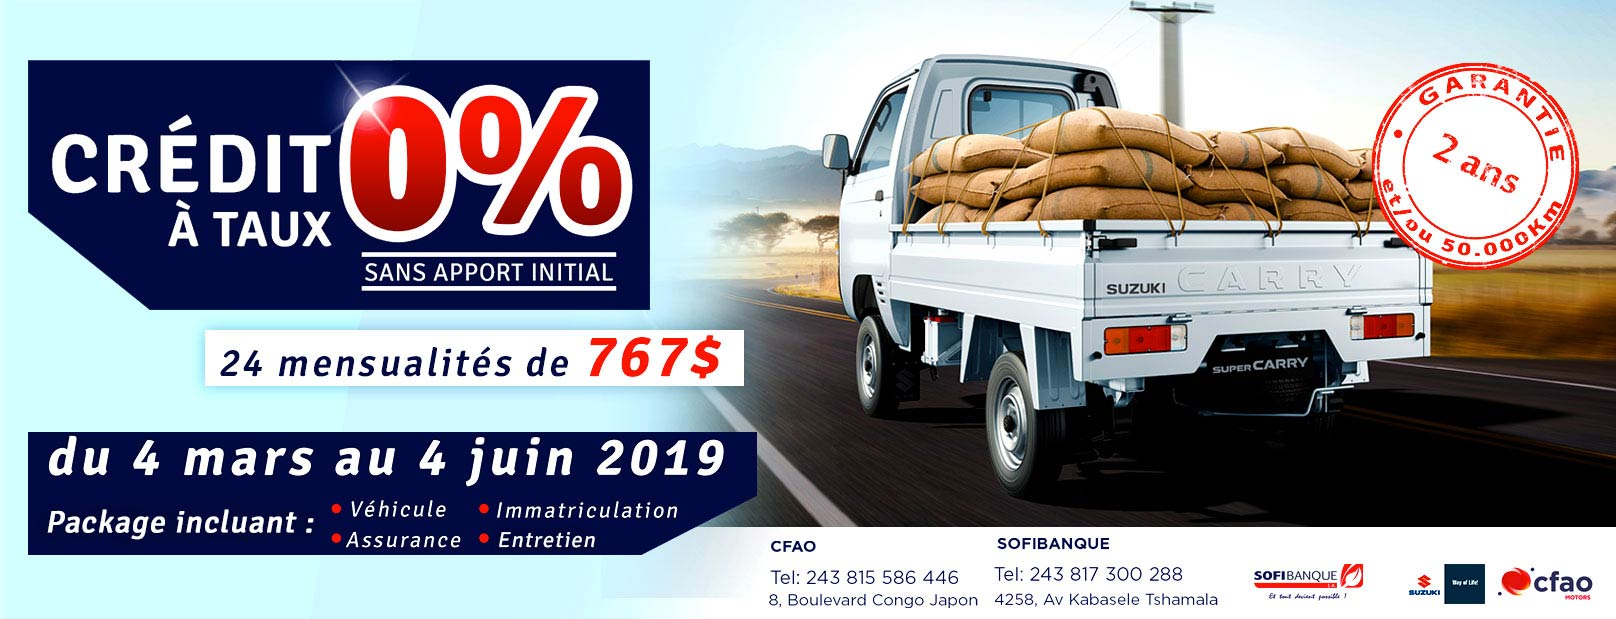 Super-CarrySOFIBANQUE-Bizcongo-CFAO-flyers-2